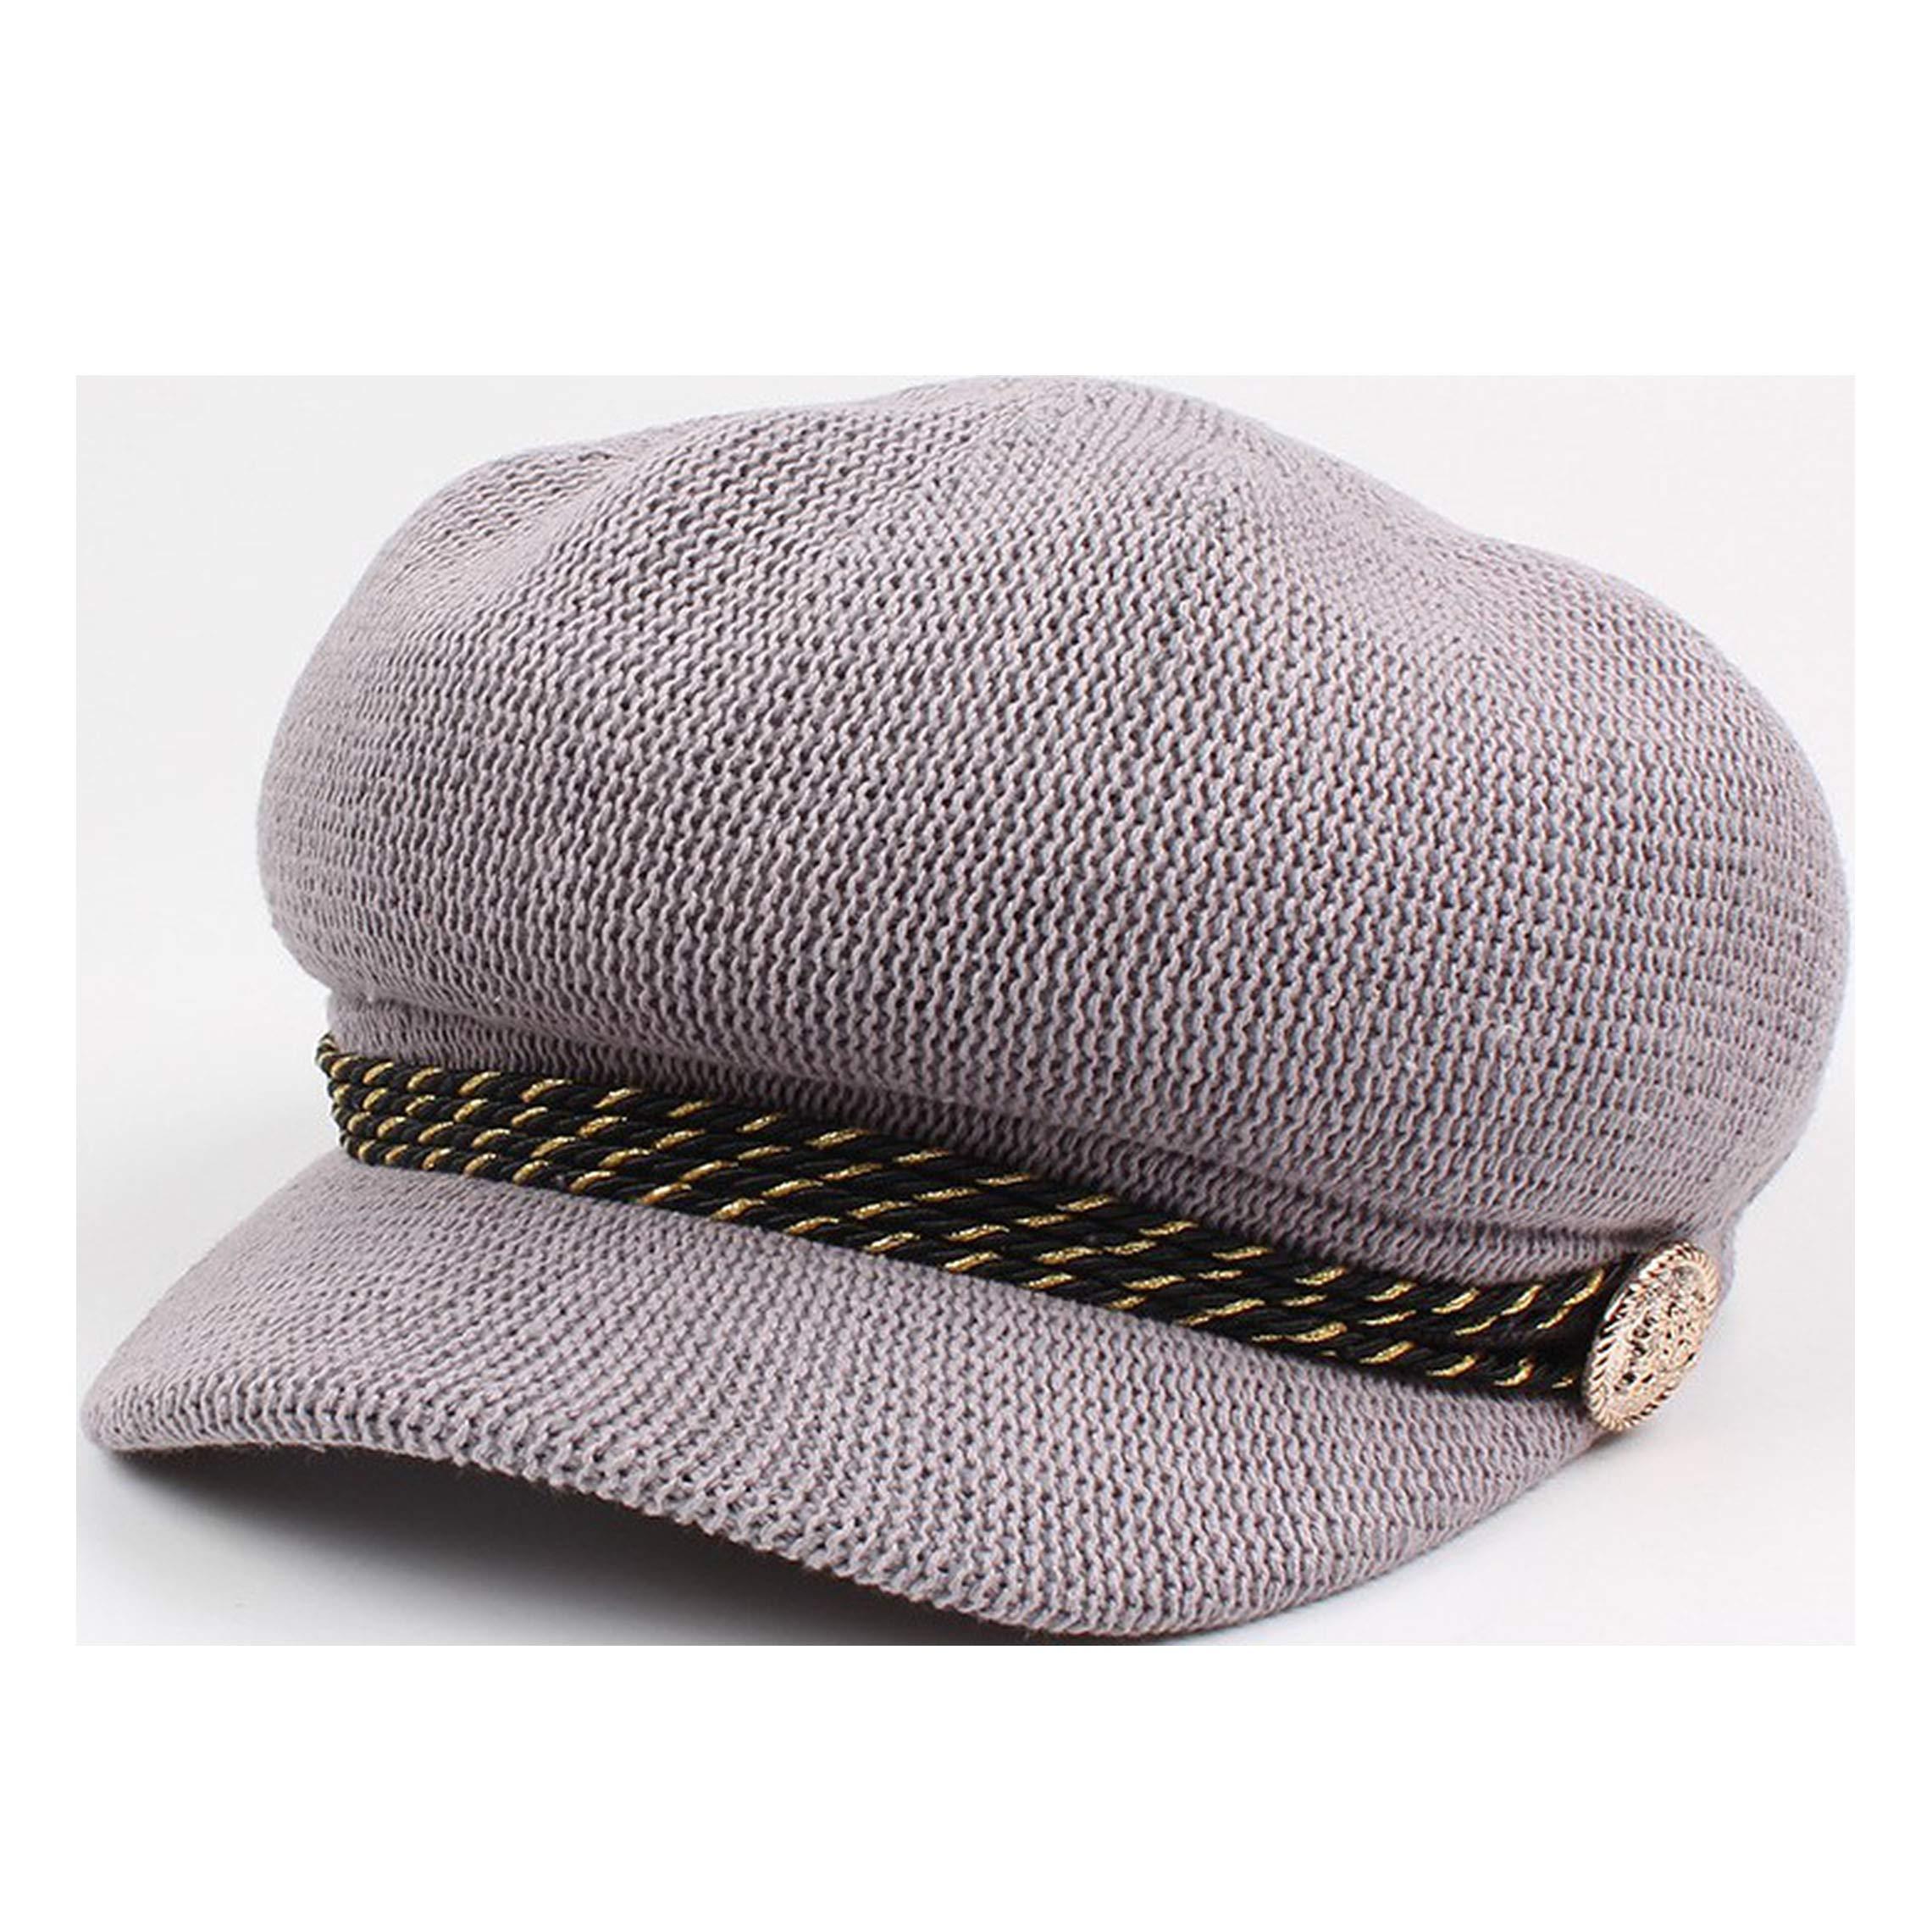 Rivet String Summer Newsboy Cap for Women Girls Breathable Octagonal Sun Hats Fashion British Berets Gray